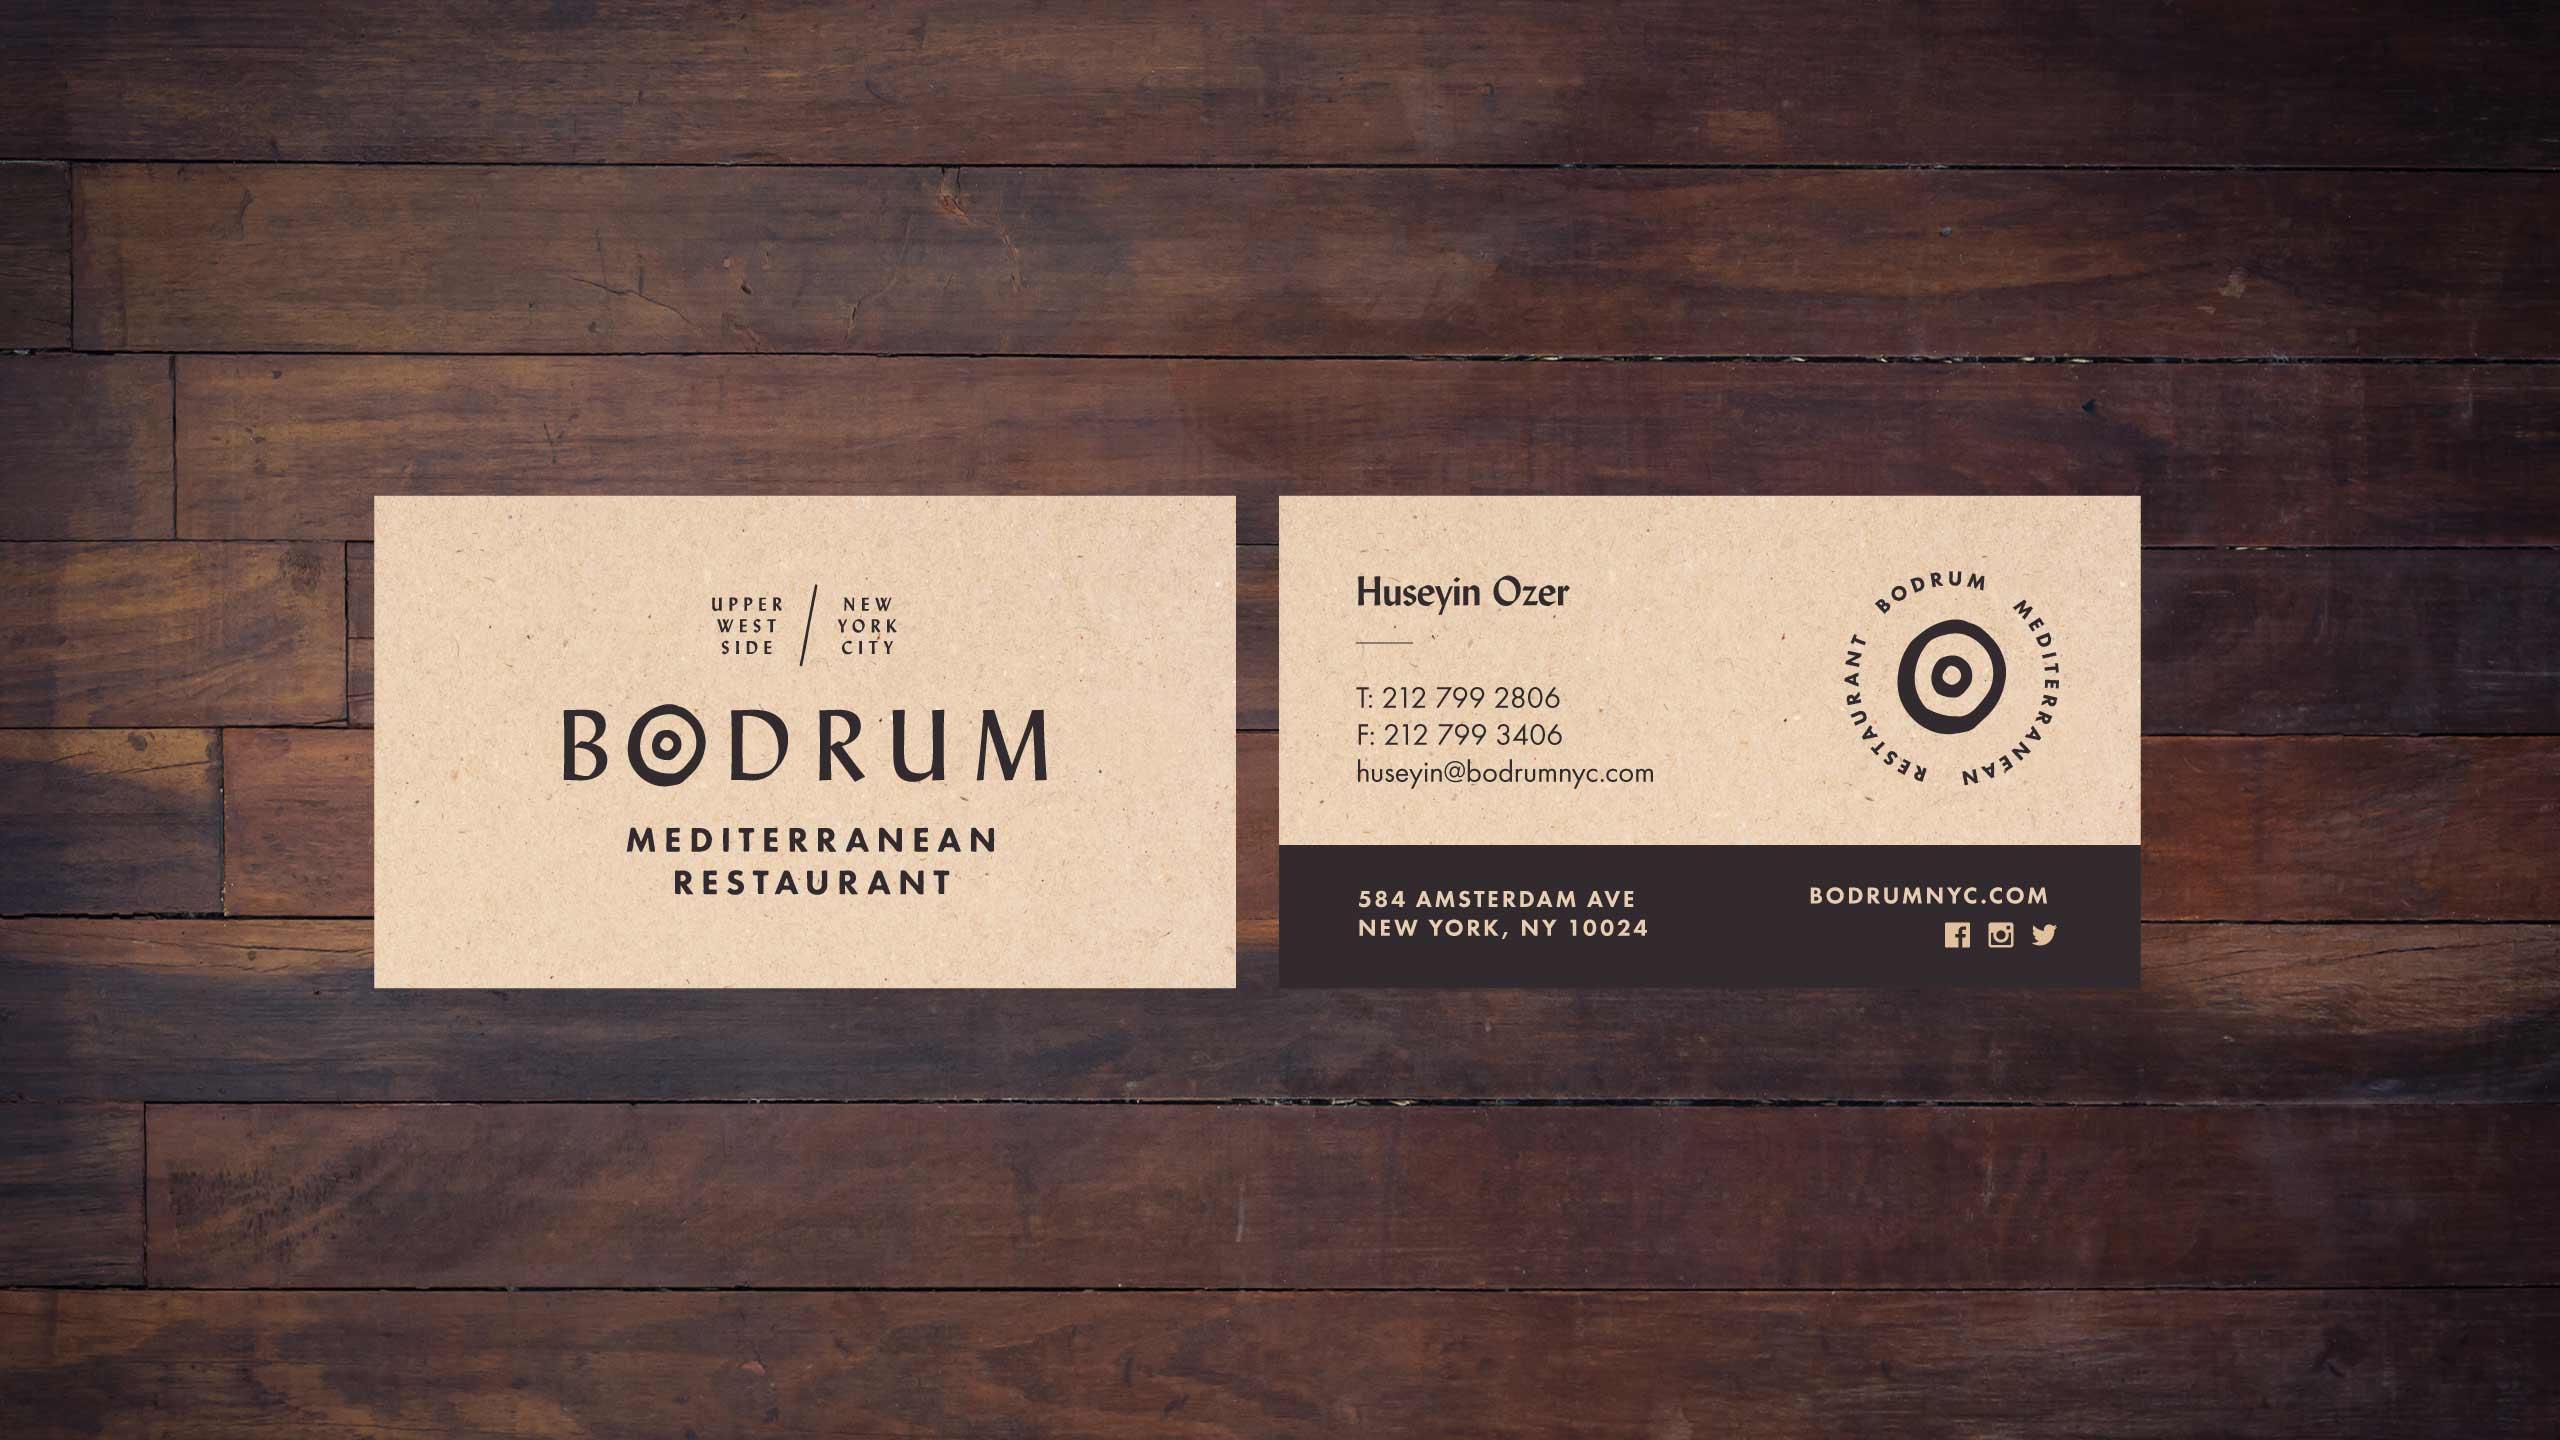 bodrum-business-card-designs